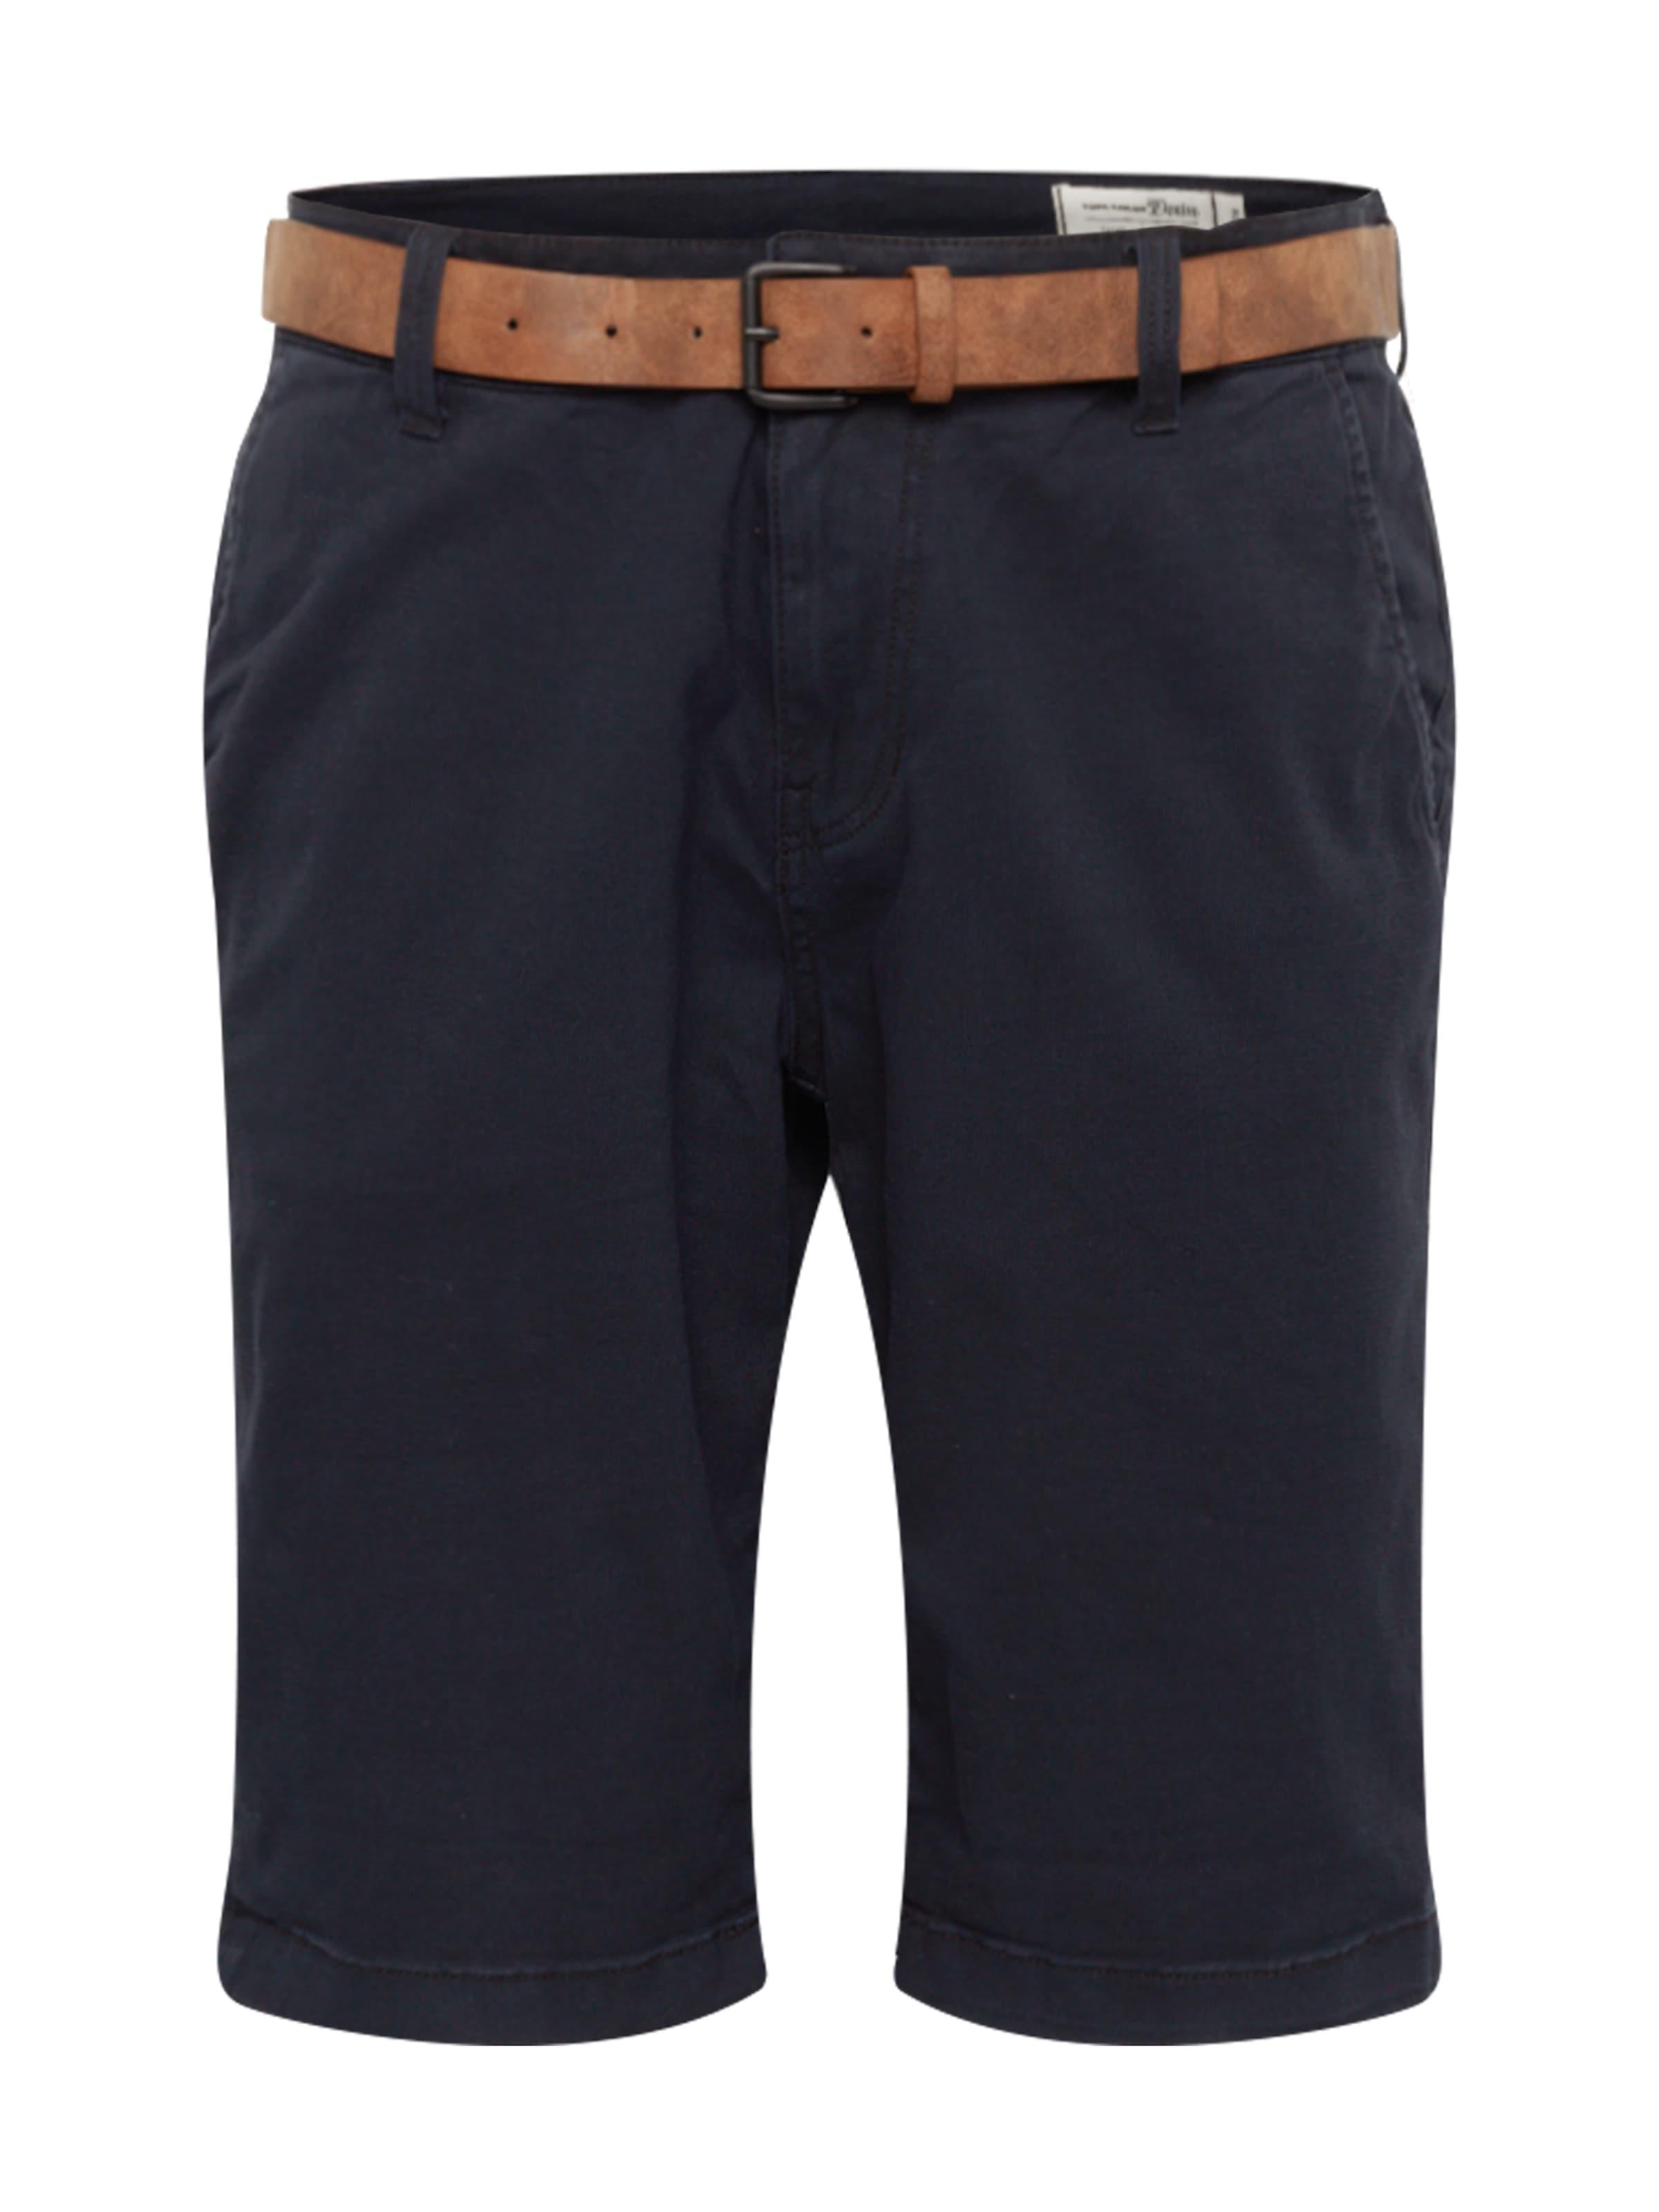 Tailor Denim Pantalon Vert Tom Chino En Clair pULSzMVqG